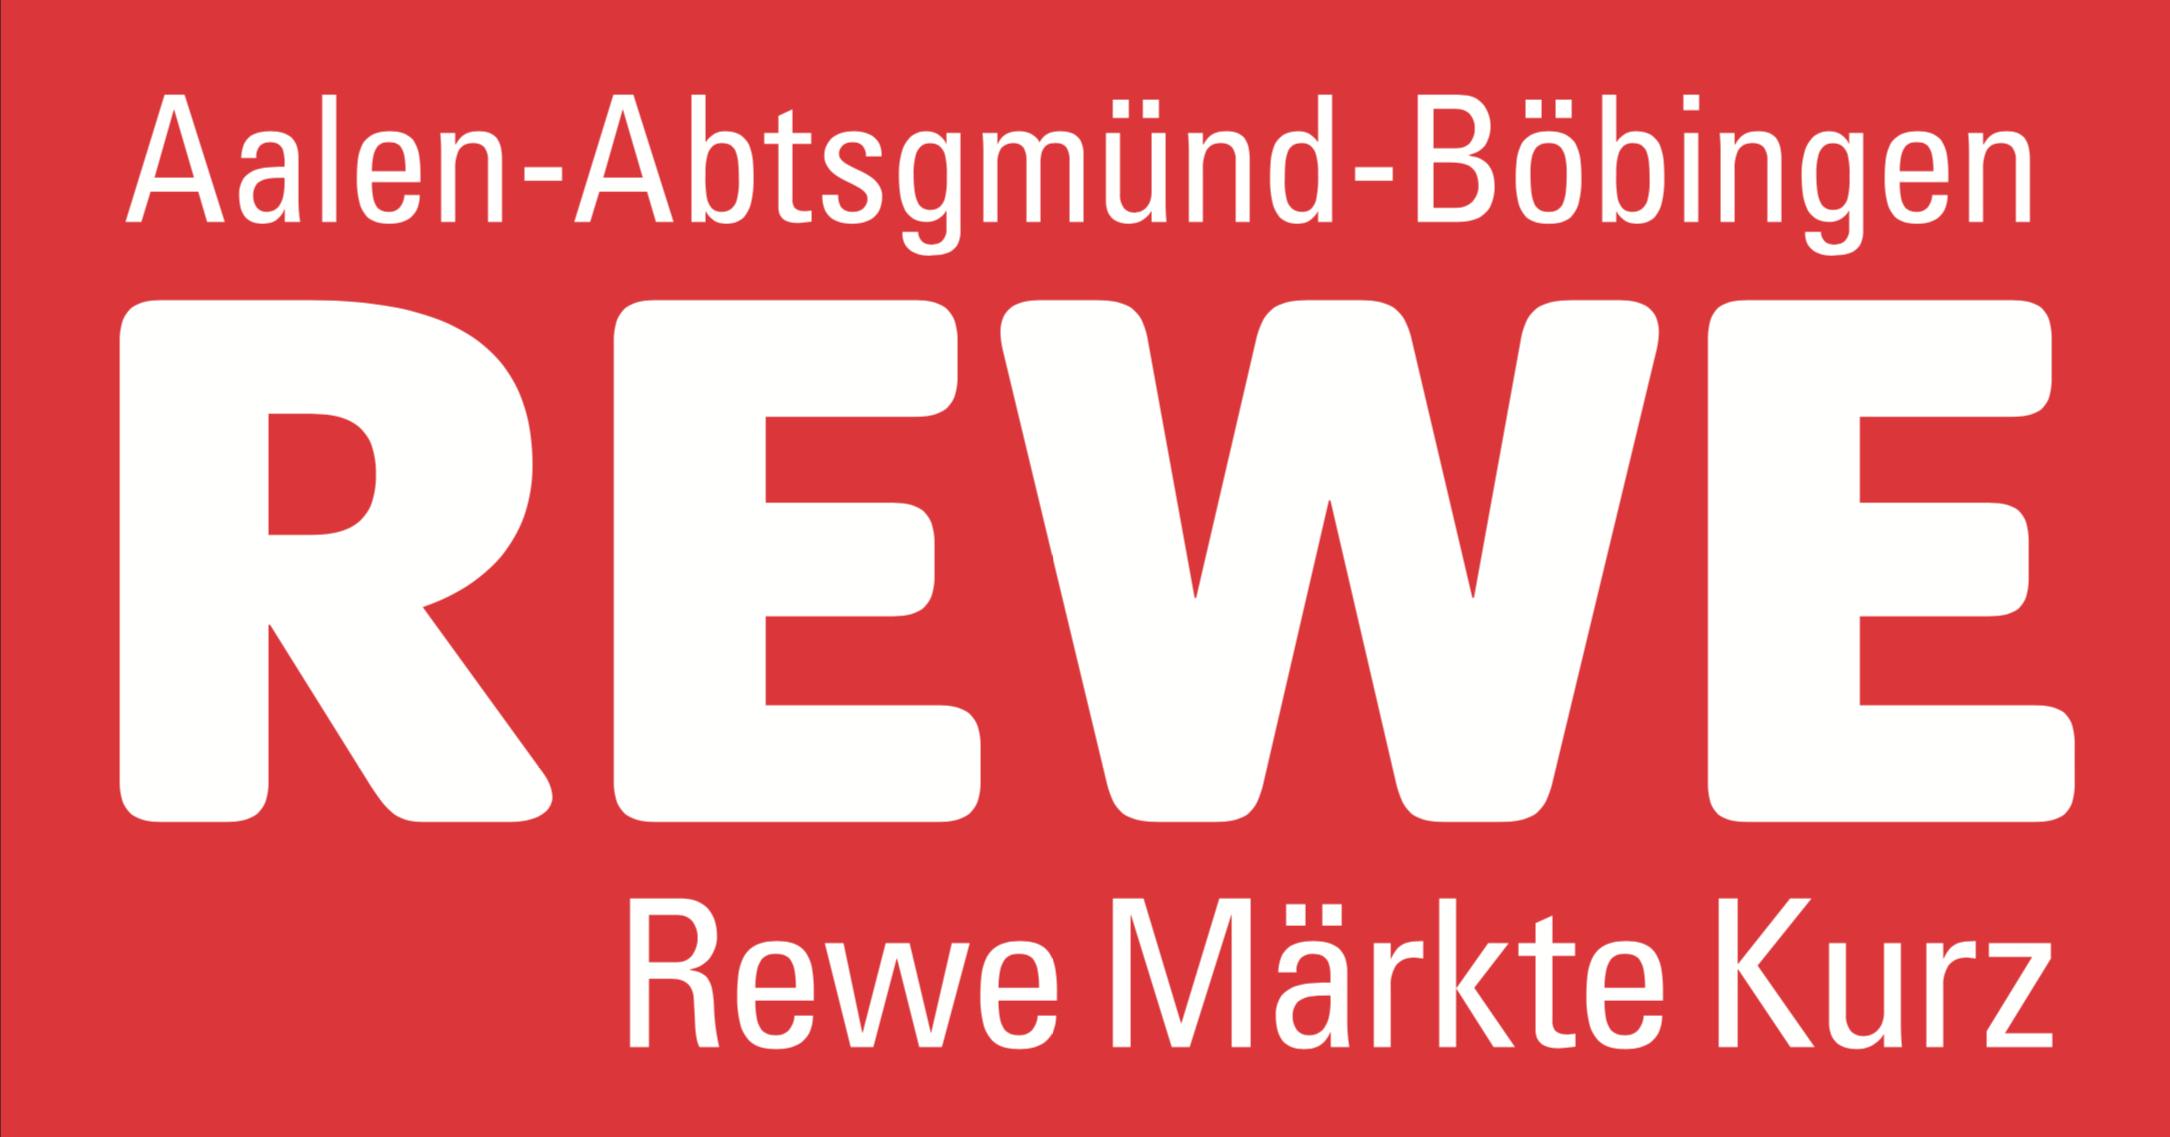 REWE-Märkte Kurz